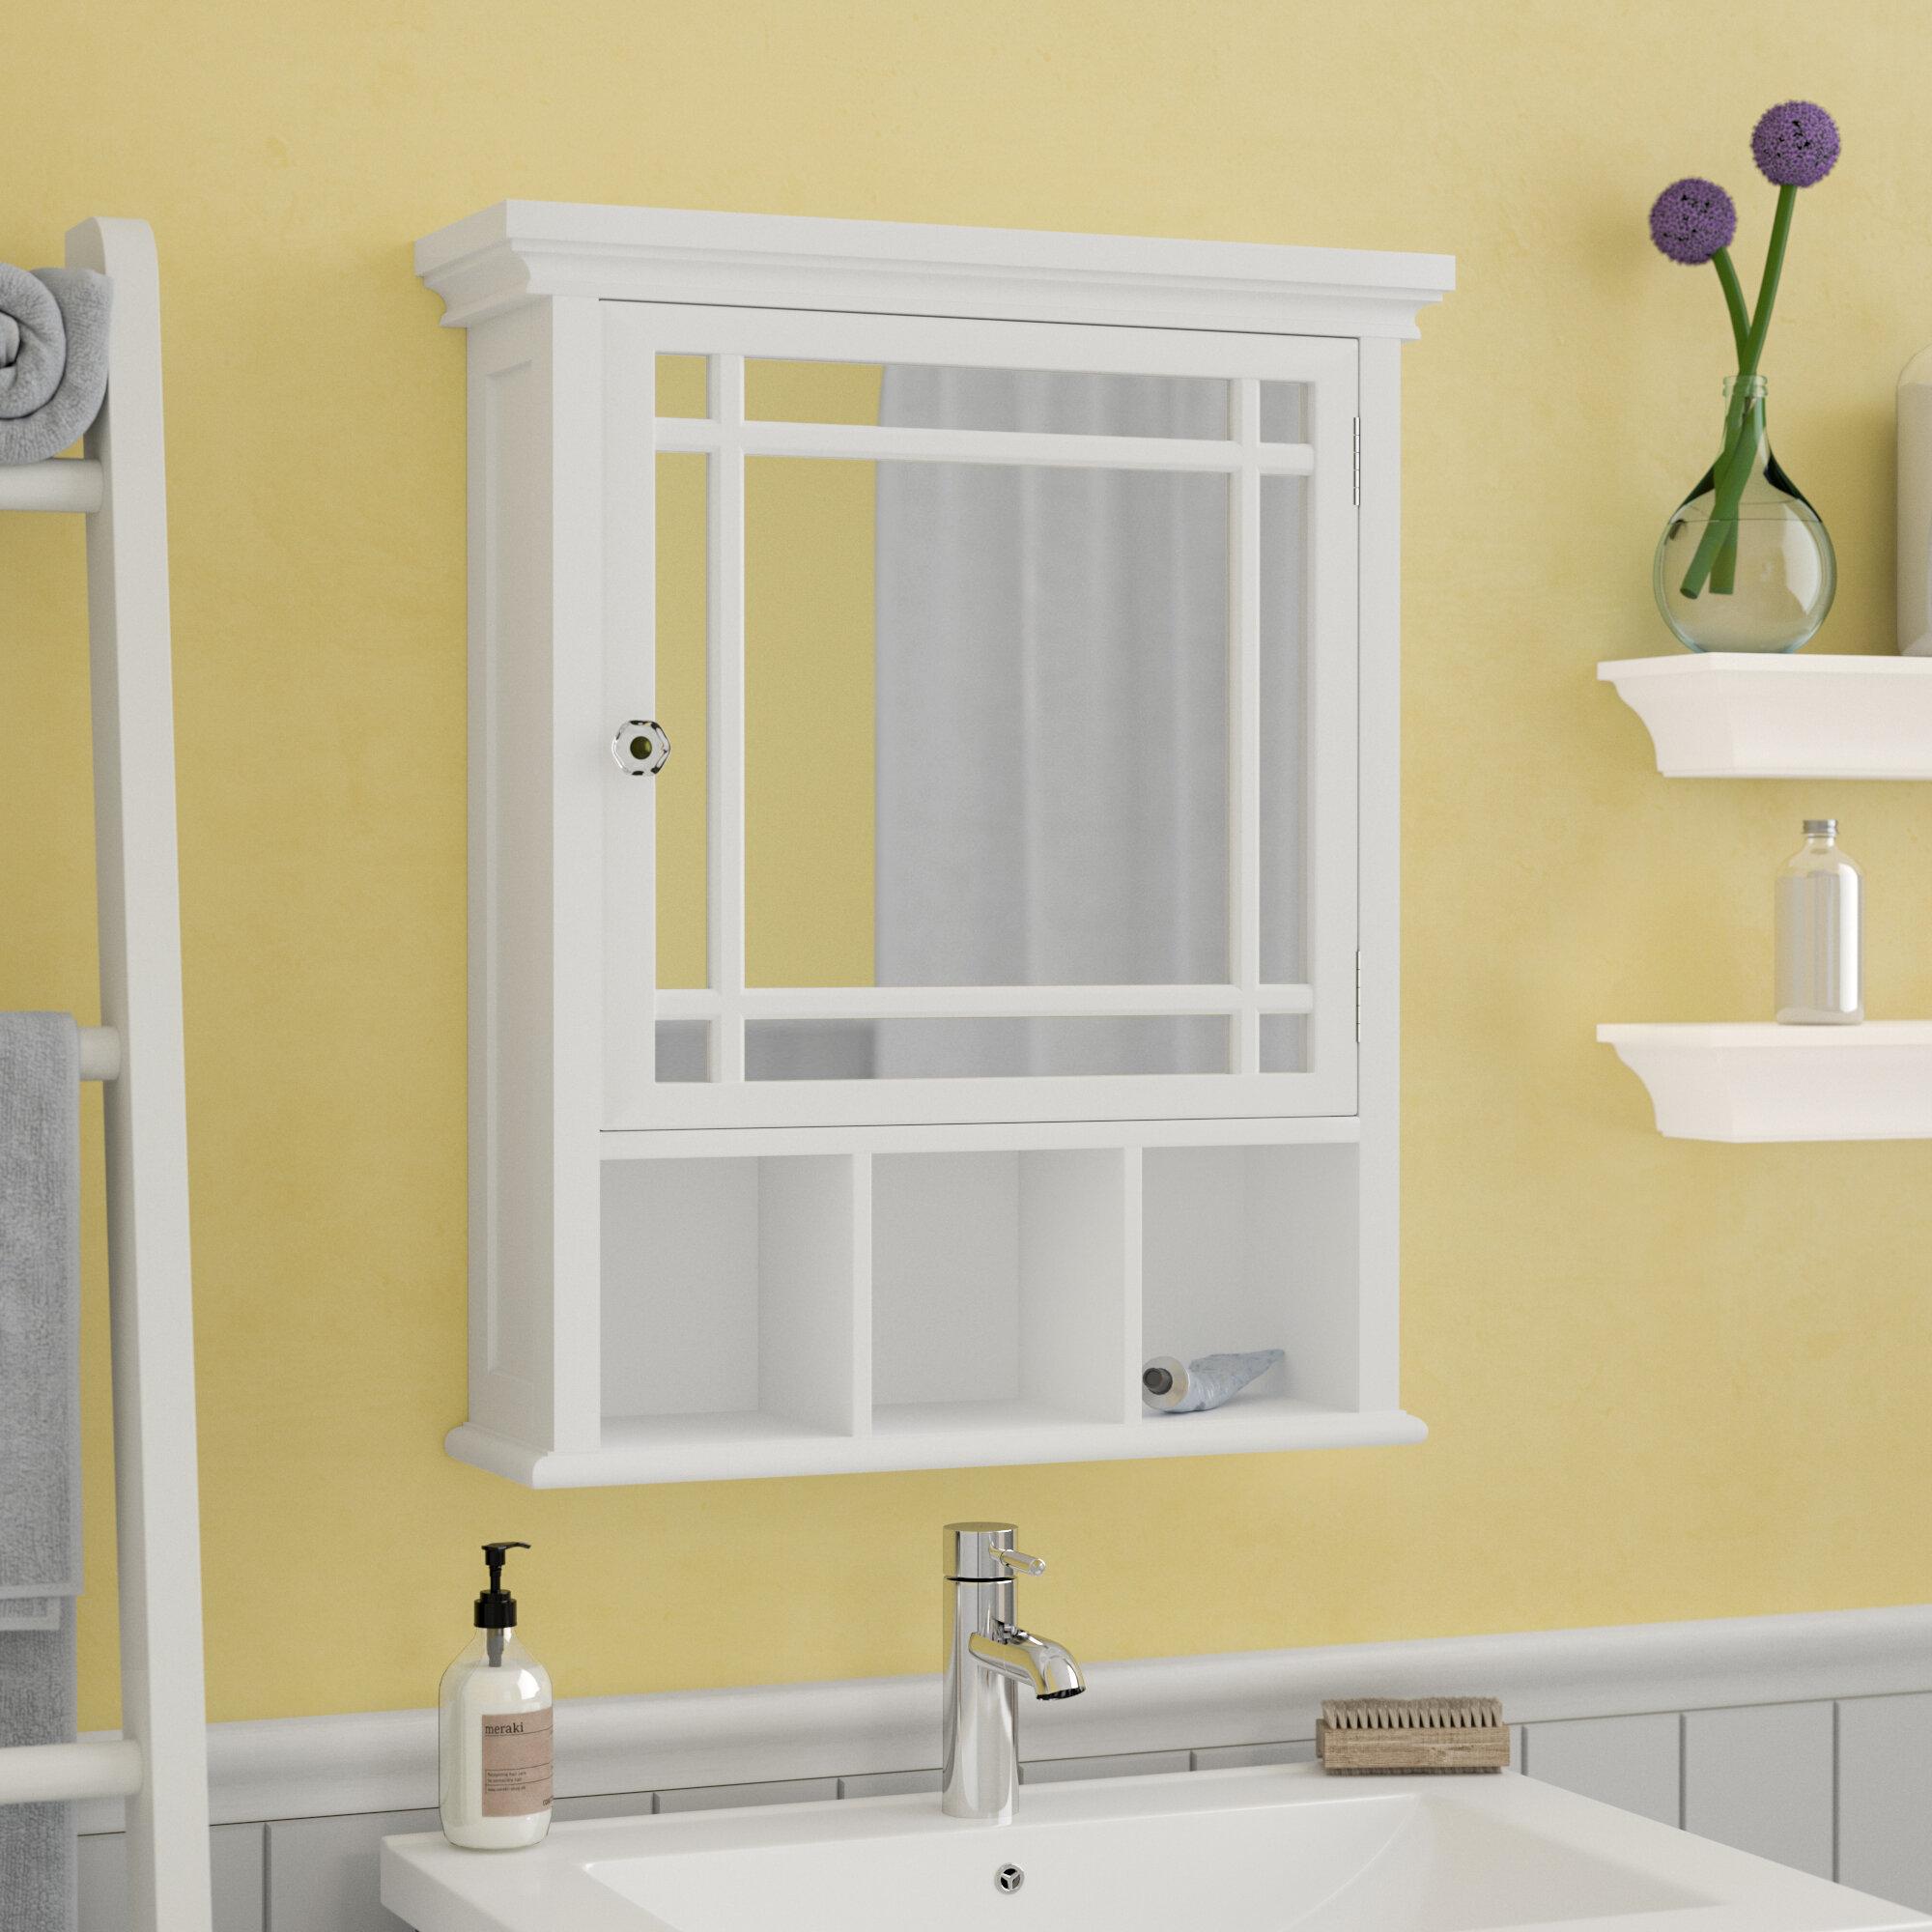 Andover Mills Taryn 20 X 24 Surface Mount Framed Medicine Cabinet With 1 Adjule Shelf Reviews Wayfair